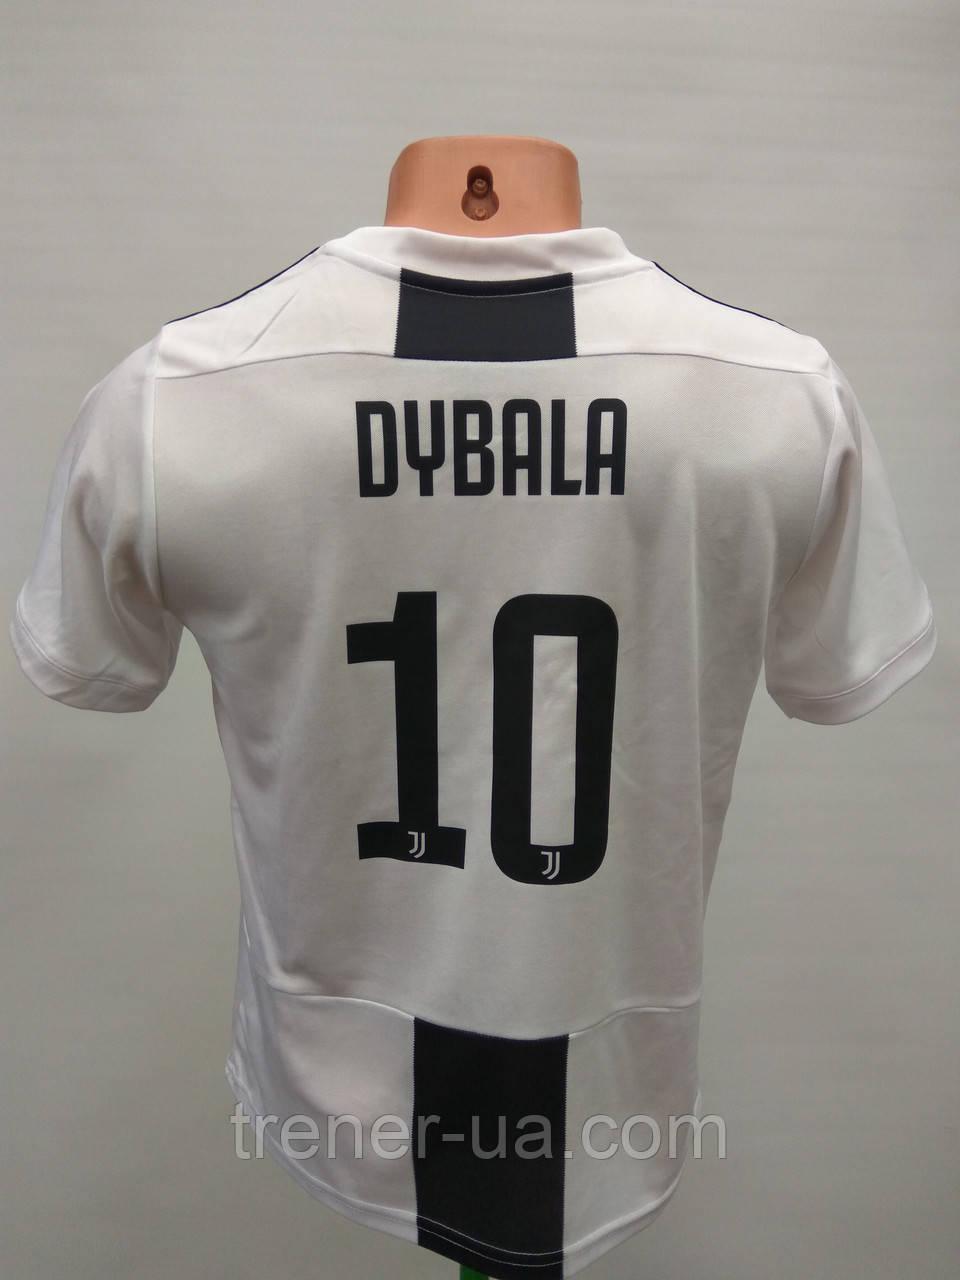 Футбольна форма дитяча в стилі Adidas Juventus Dybala чорно-біла сезон 2018-19